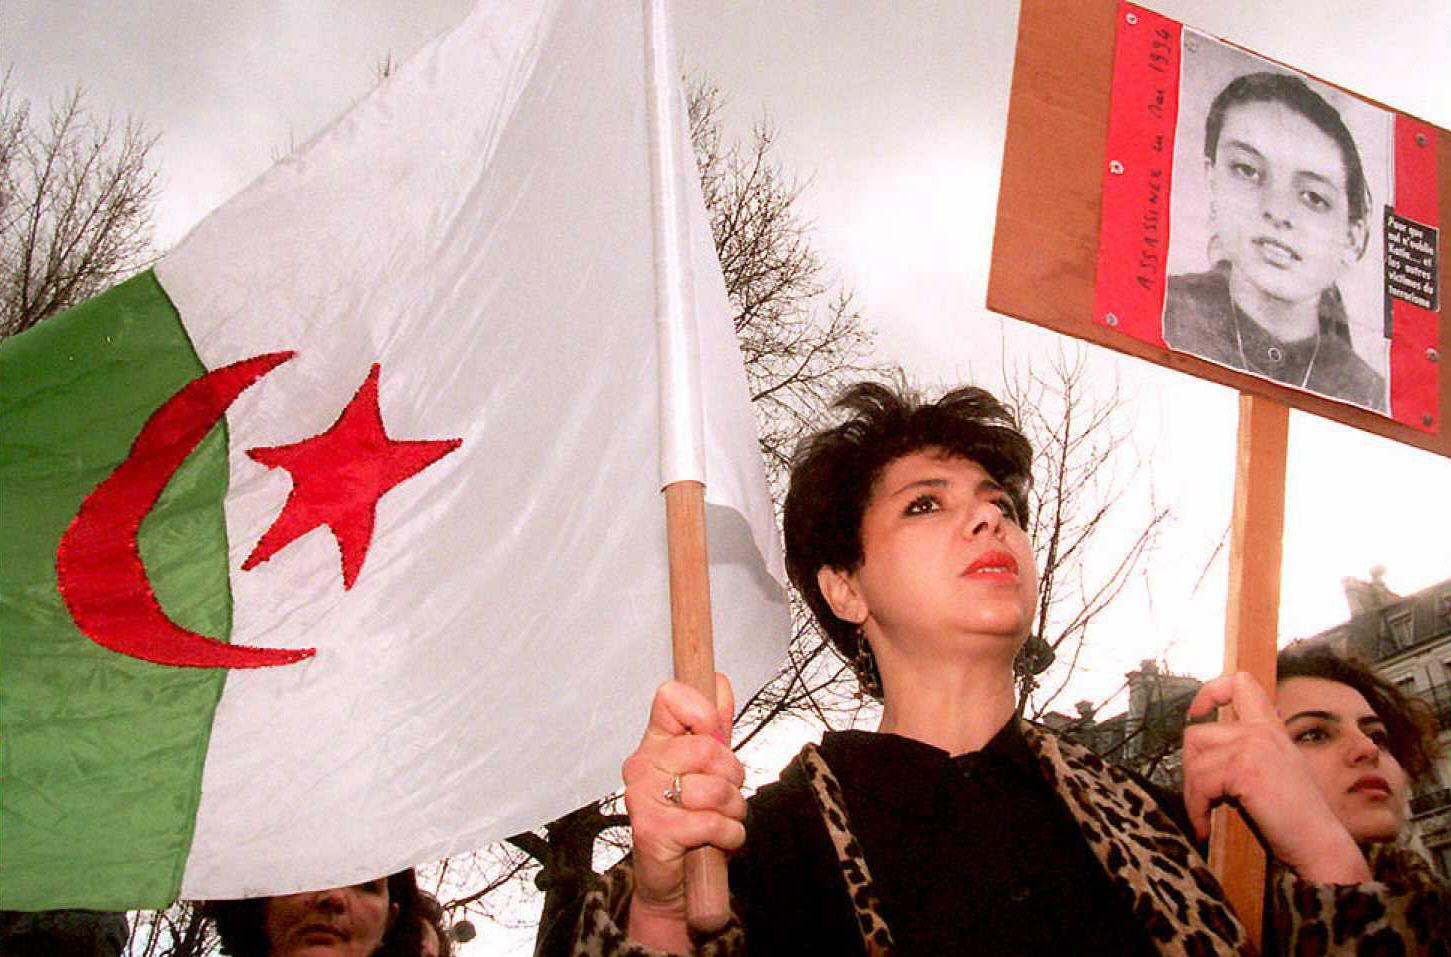 Violence Against Women in France, 1995